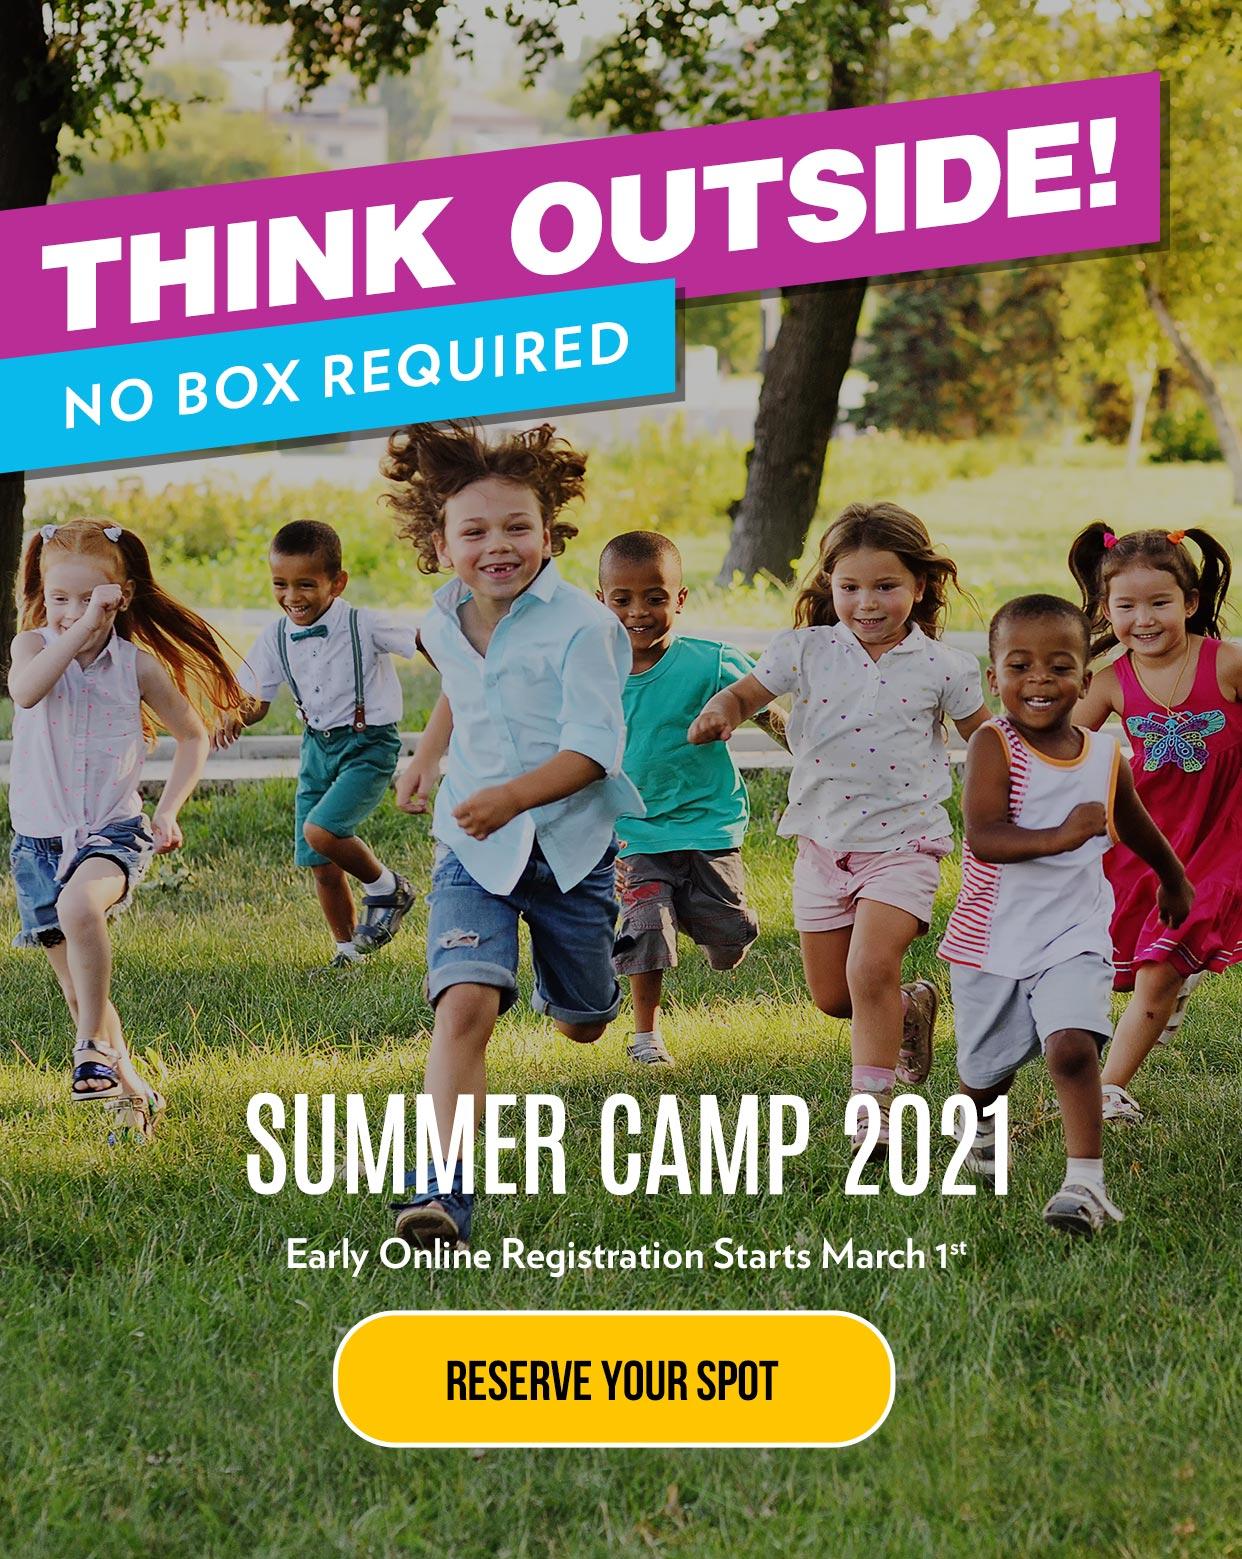 Summer Camp 2021 Mobile